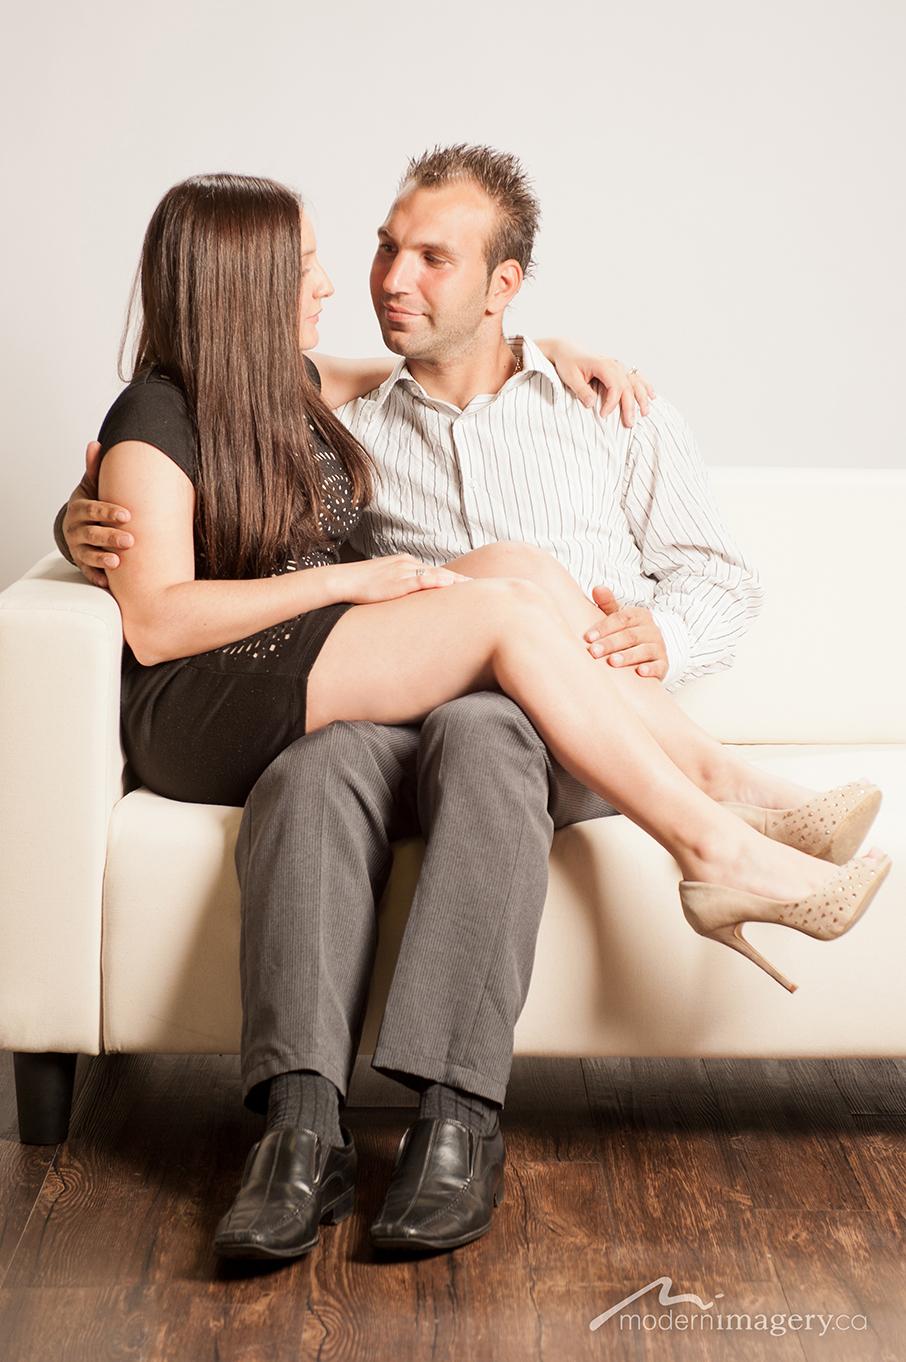 Rita&Tomasso-8.jpg